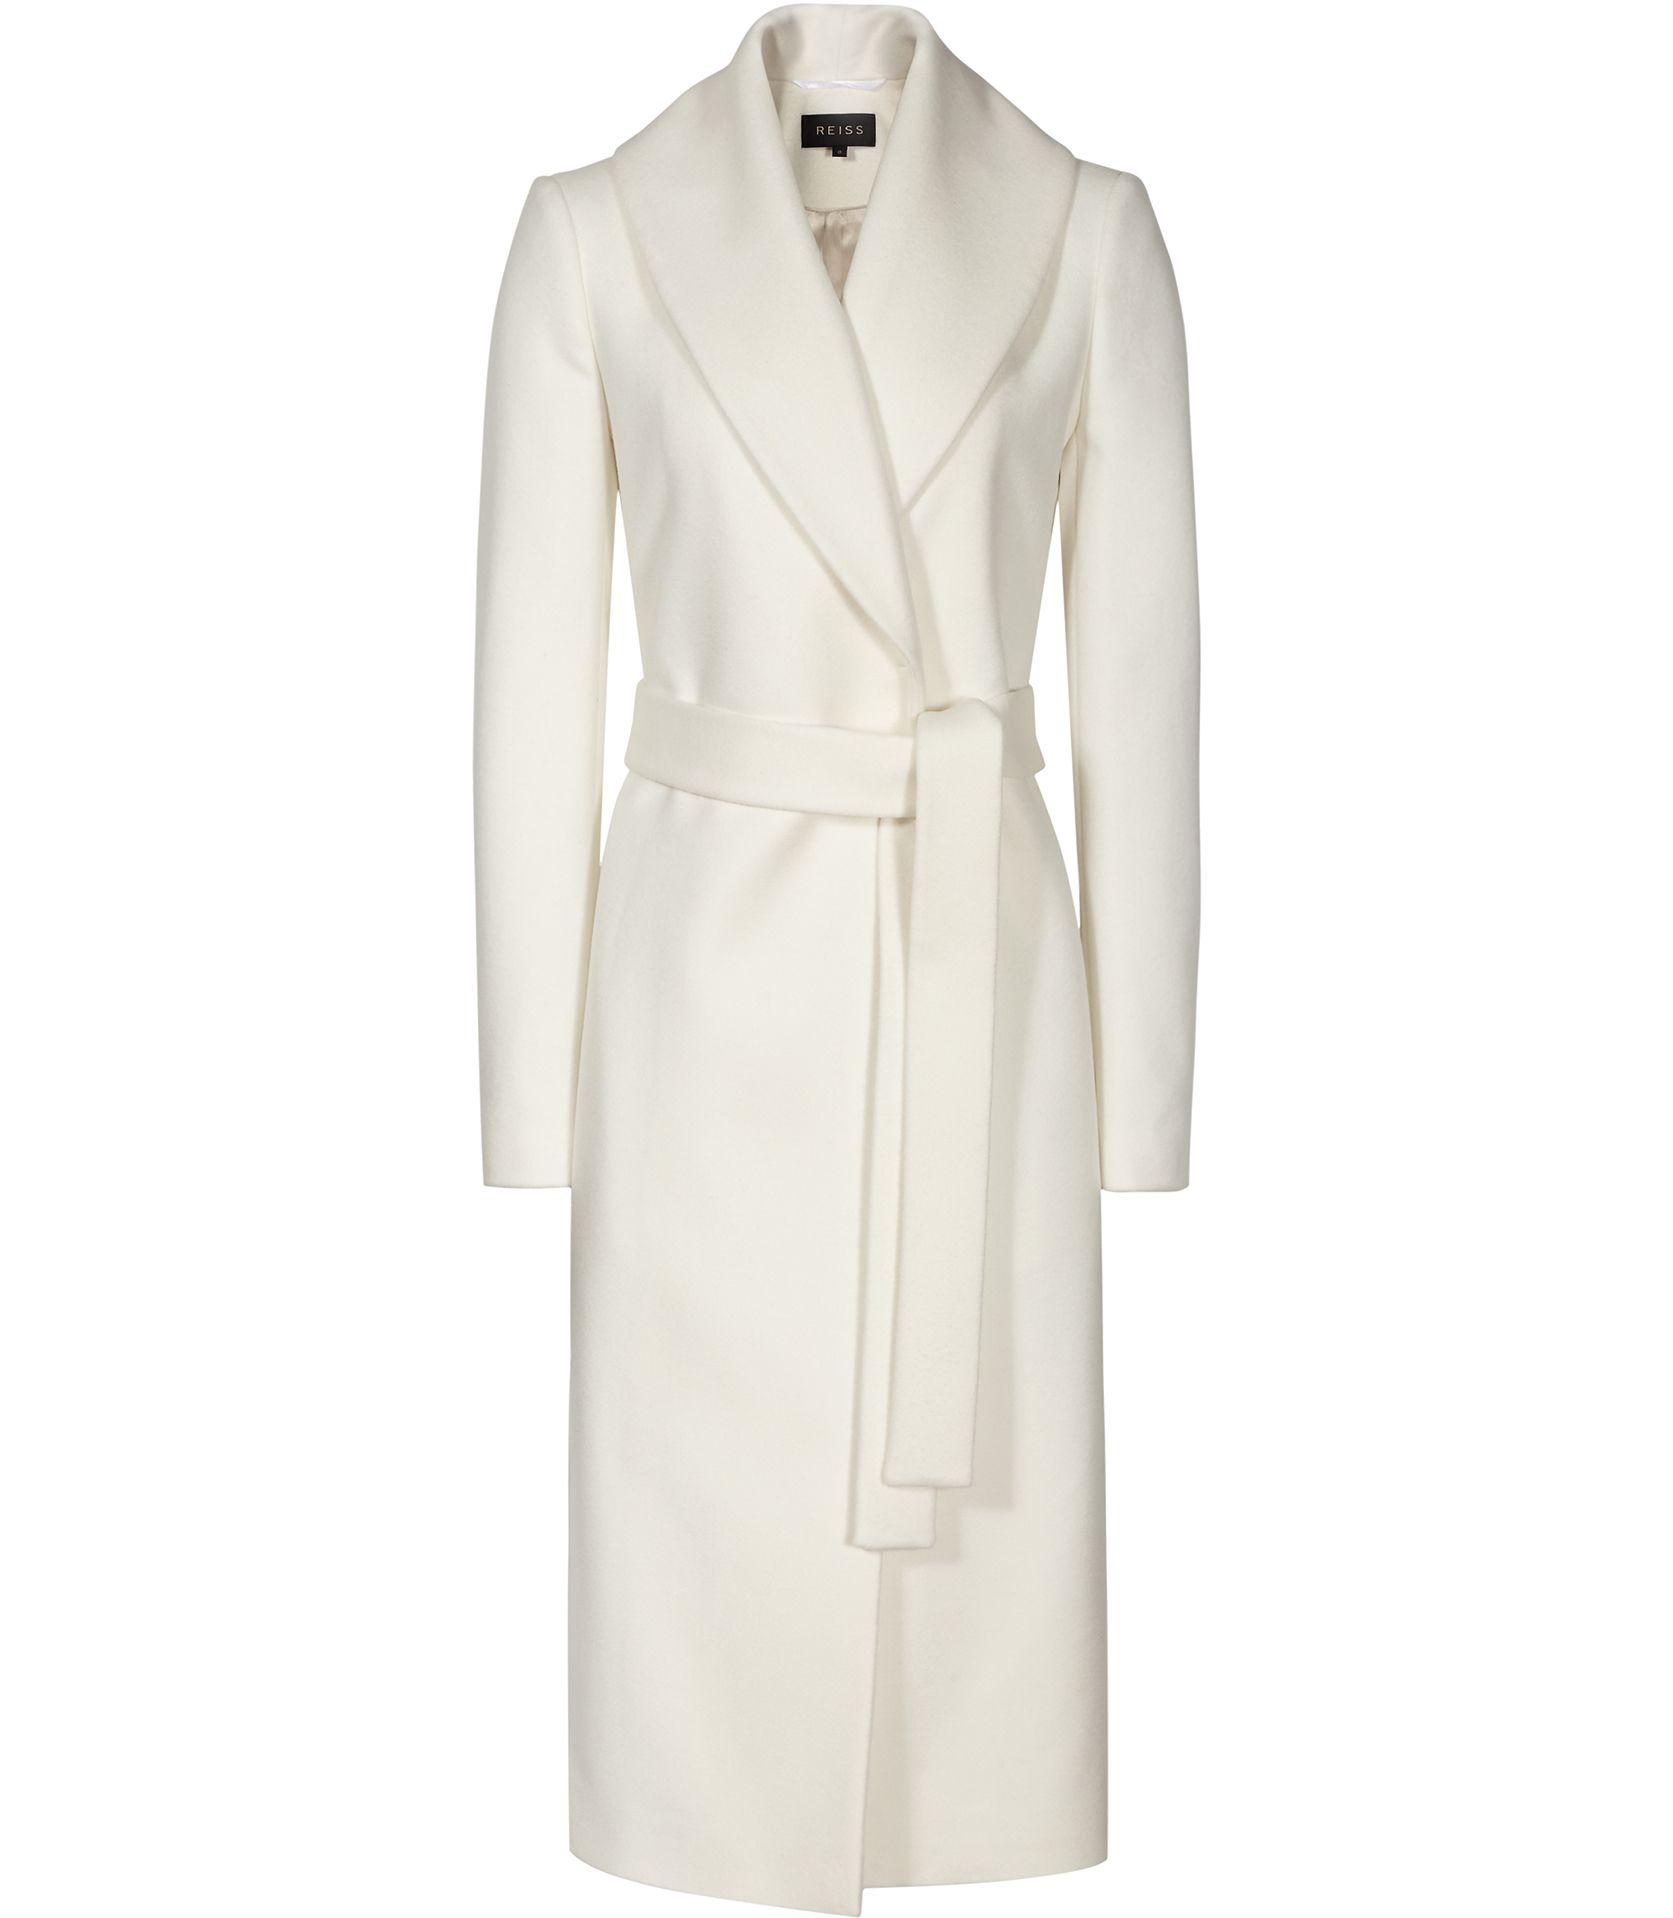 Image result for off white womens dress coat  0914ca033e